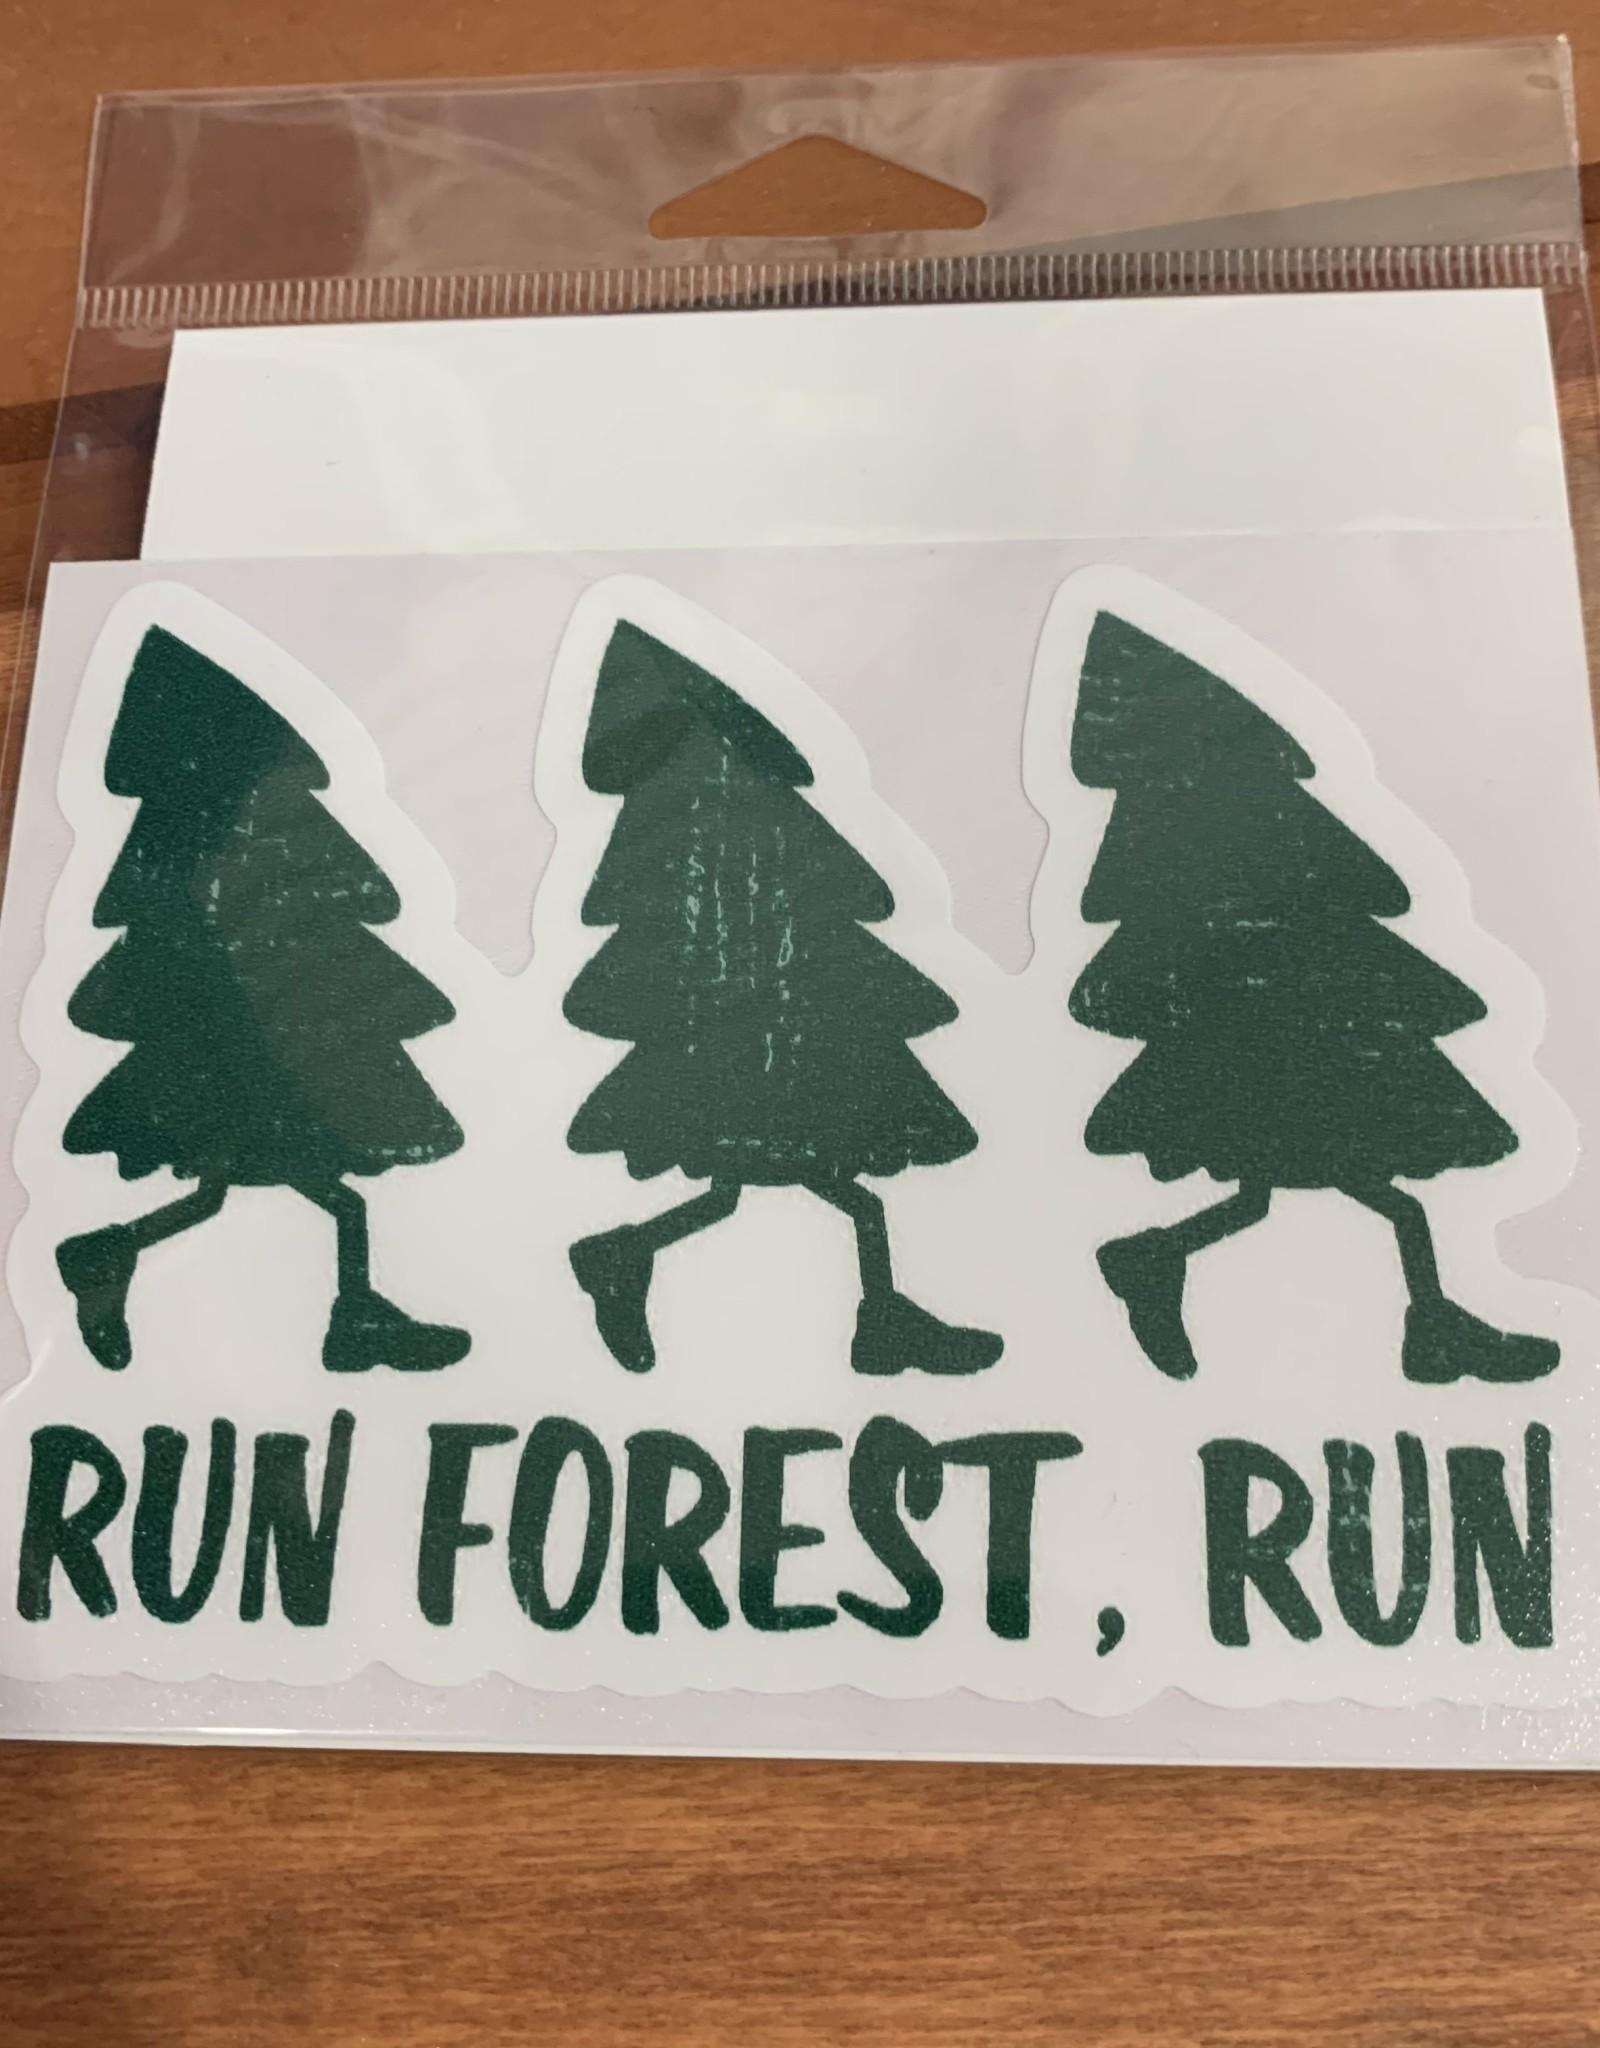 RUN FOREST RUN STICKER (LARGE)